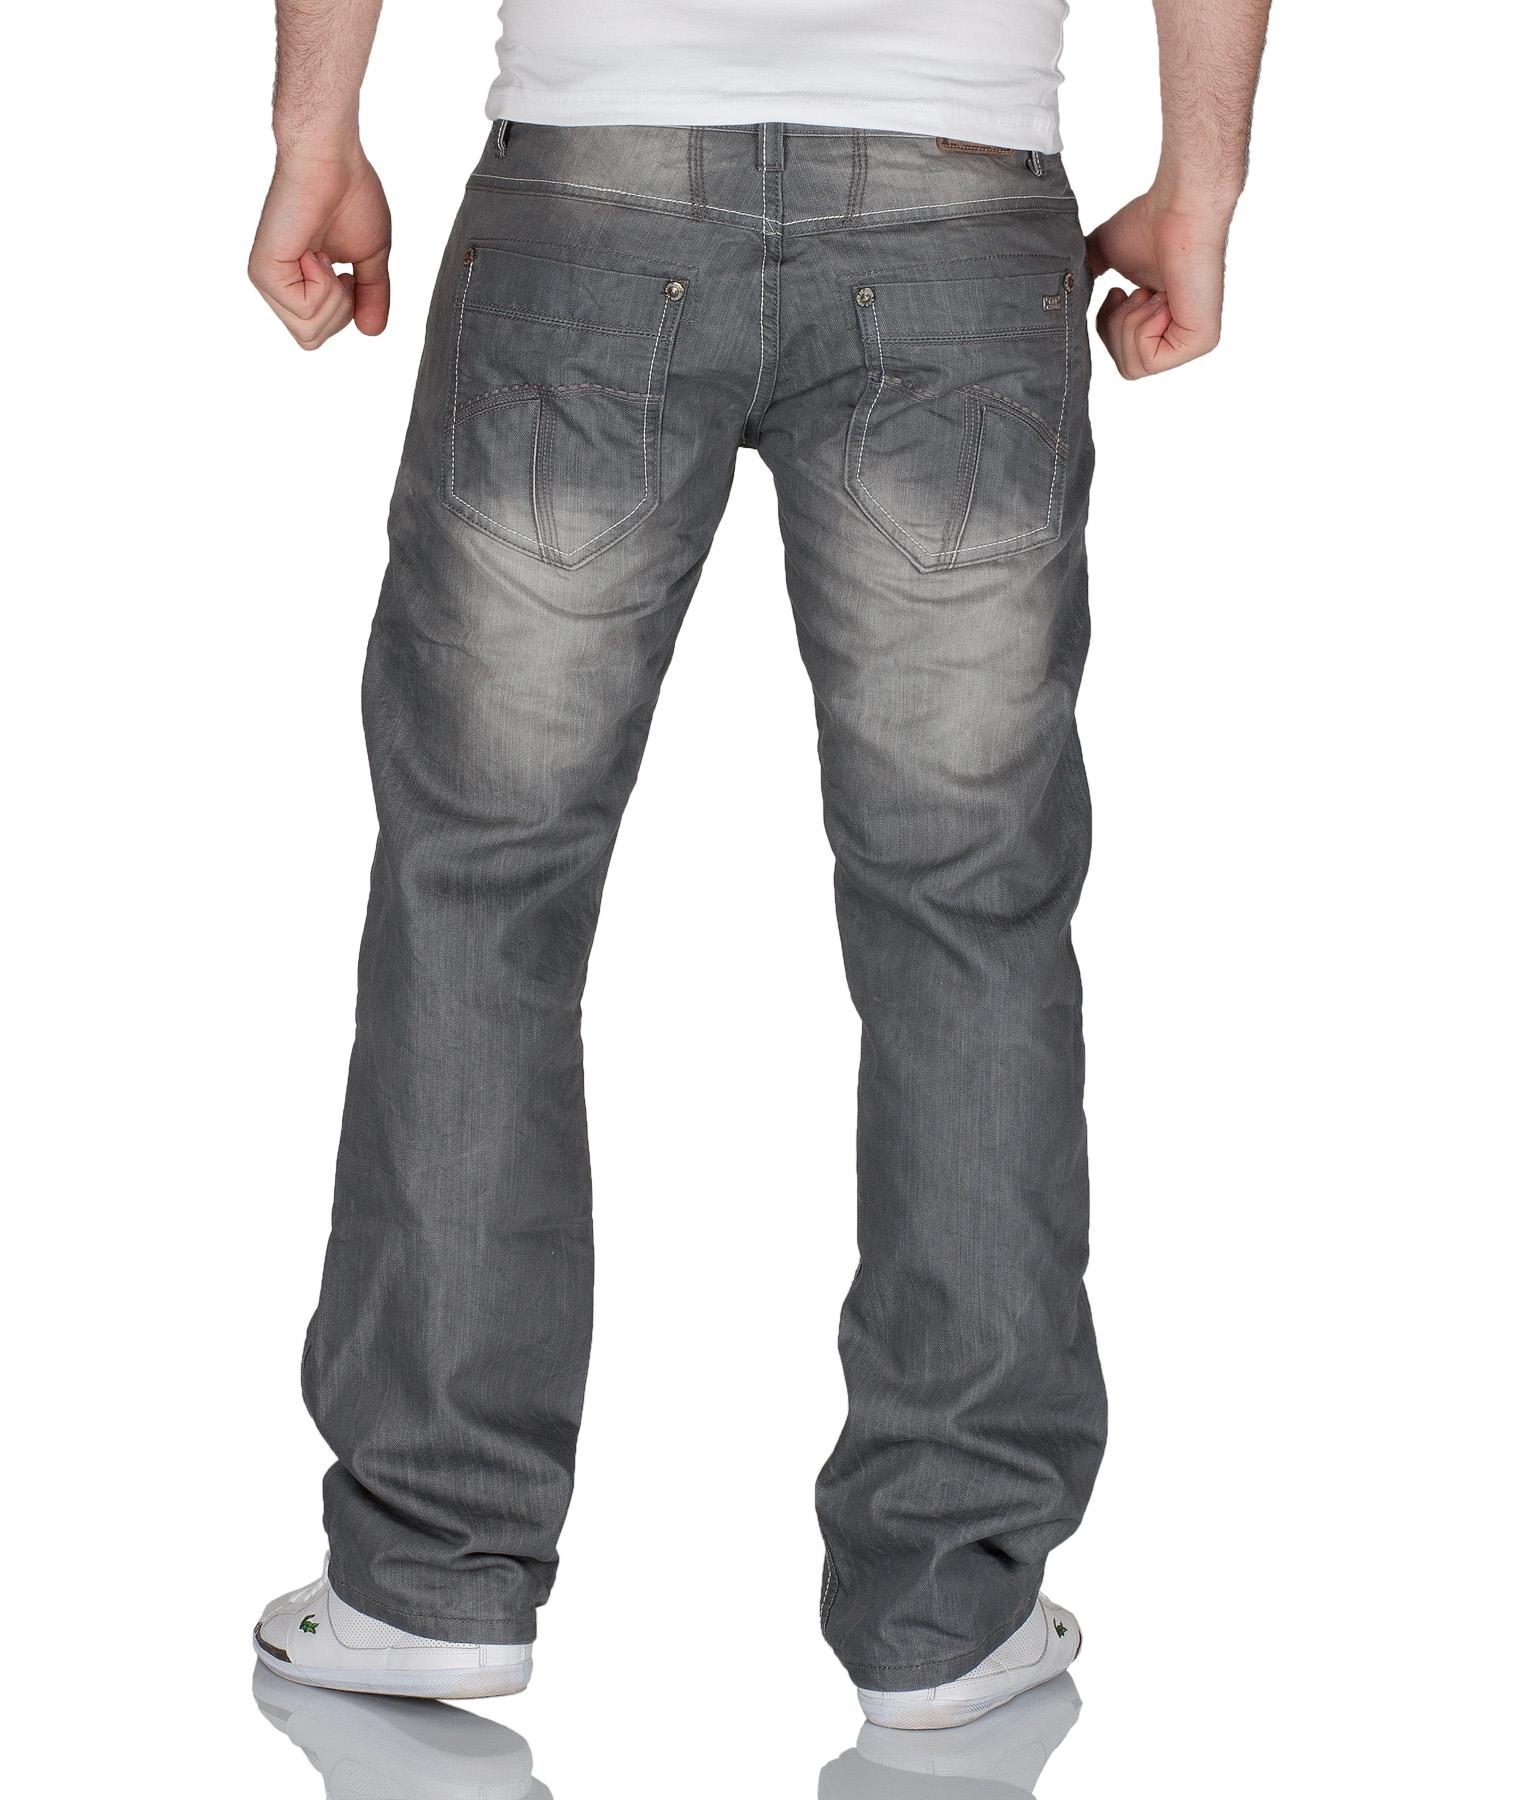 pin jeans herren hose miracle of denim 2012 star mod 3876 grau dg on pinterest. Black Bedroom Furniture Sets. Home Design Ideas